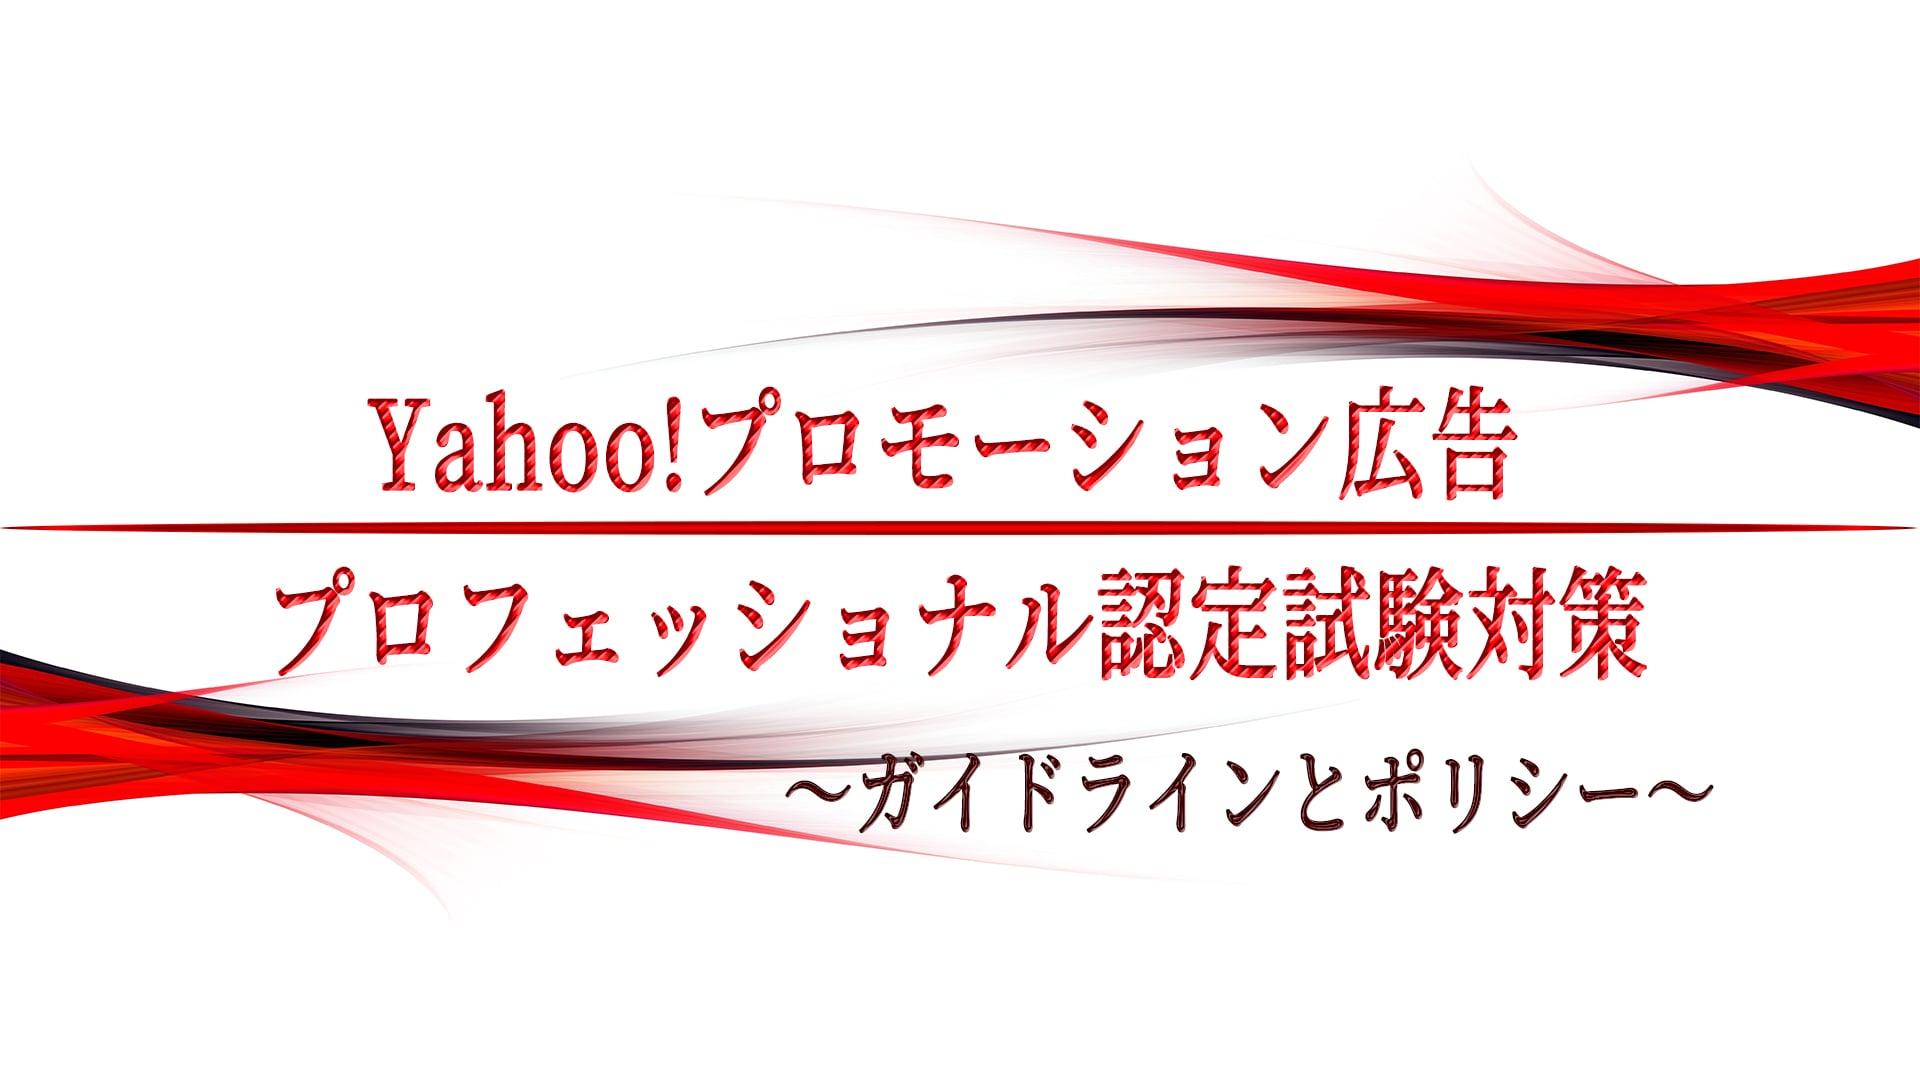 Yahoo!プロモーション広告 プロフェッショナル認定試験対策 〜ガイドラインとポリシー〜